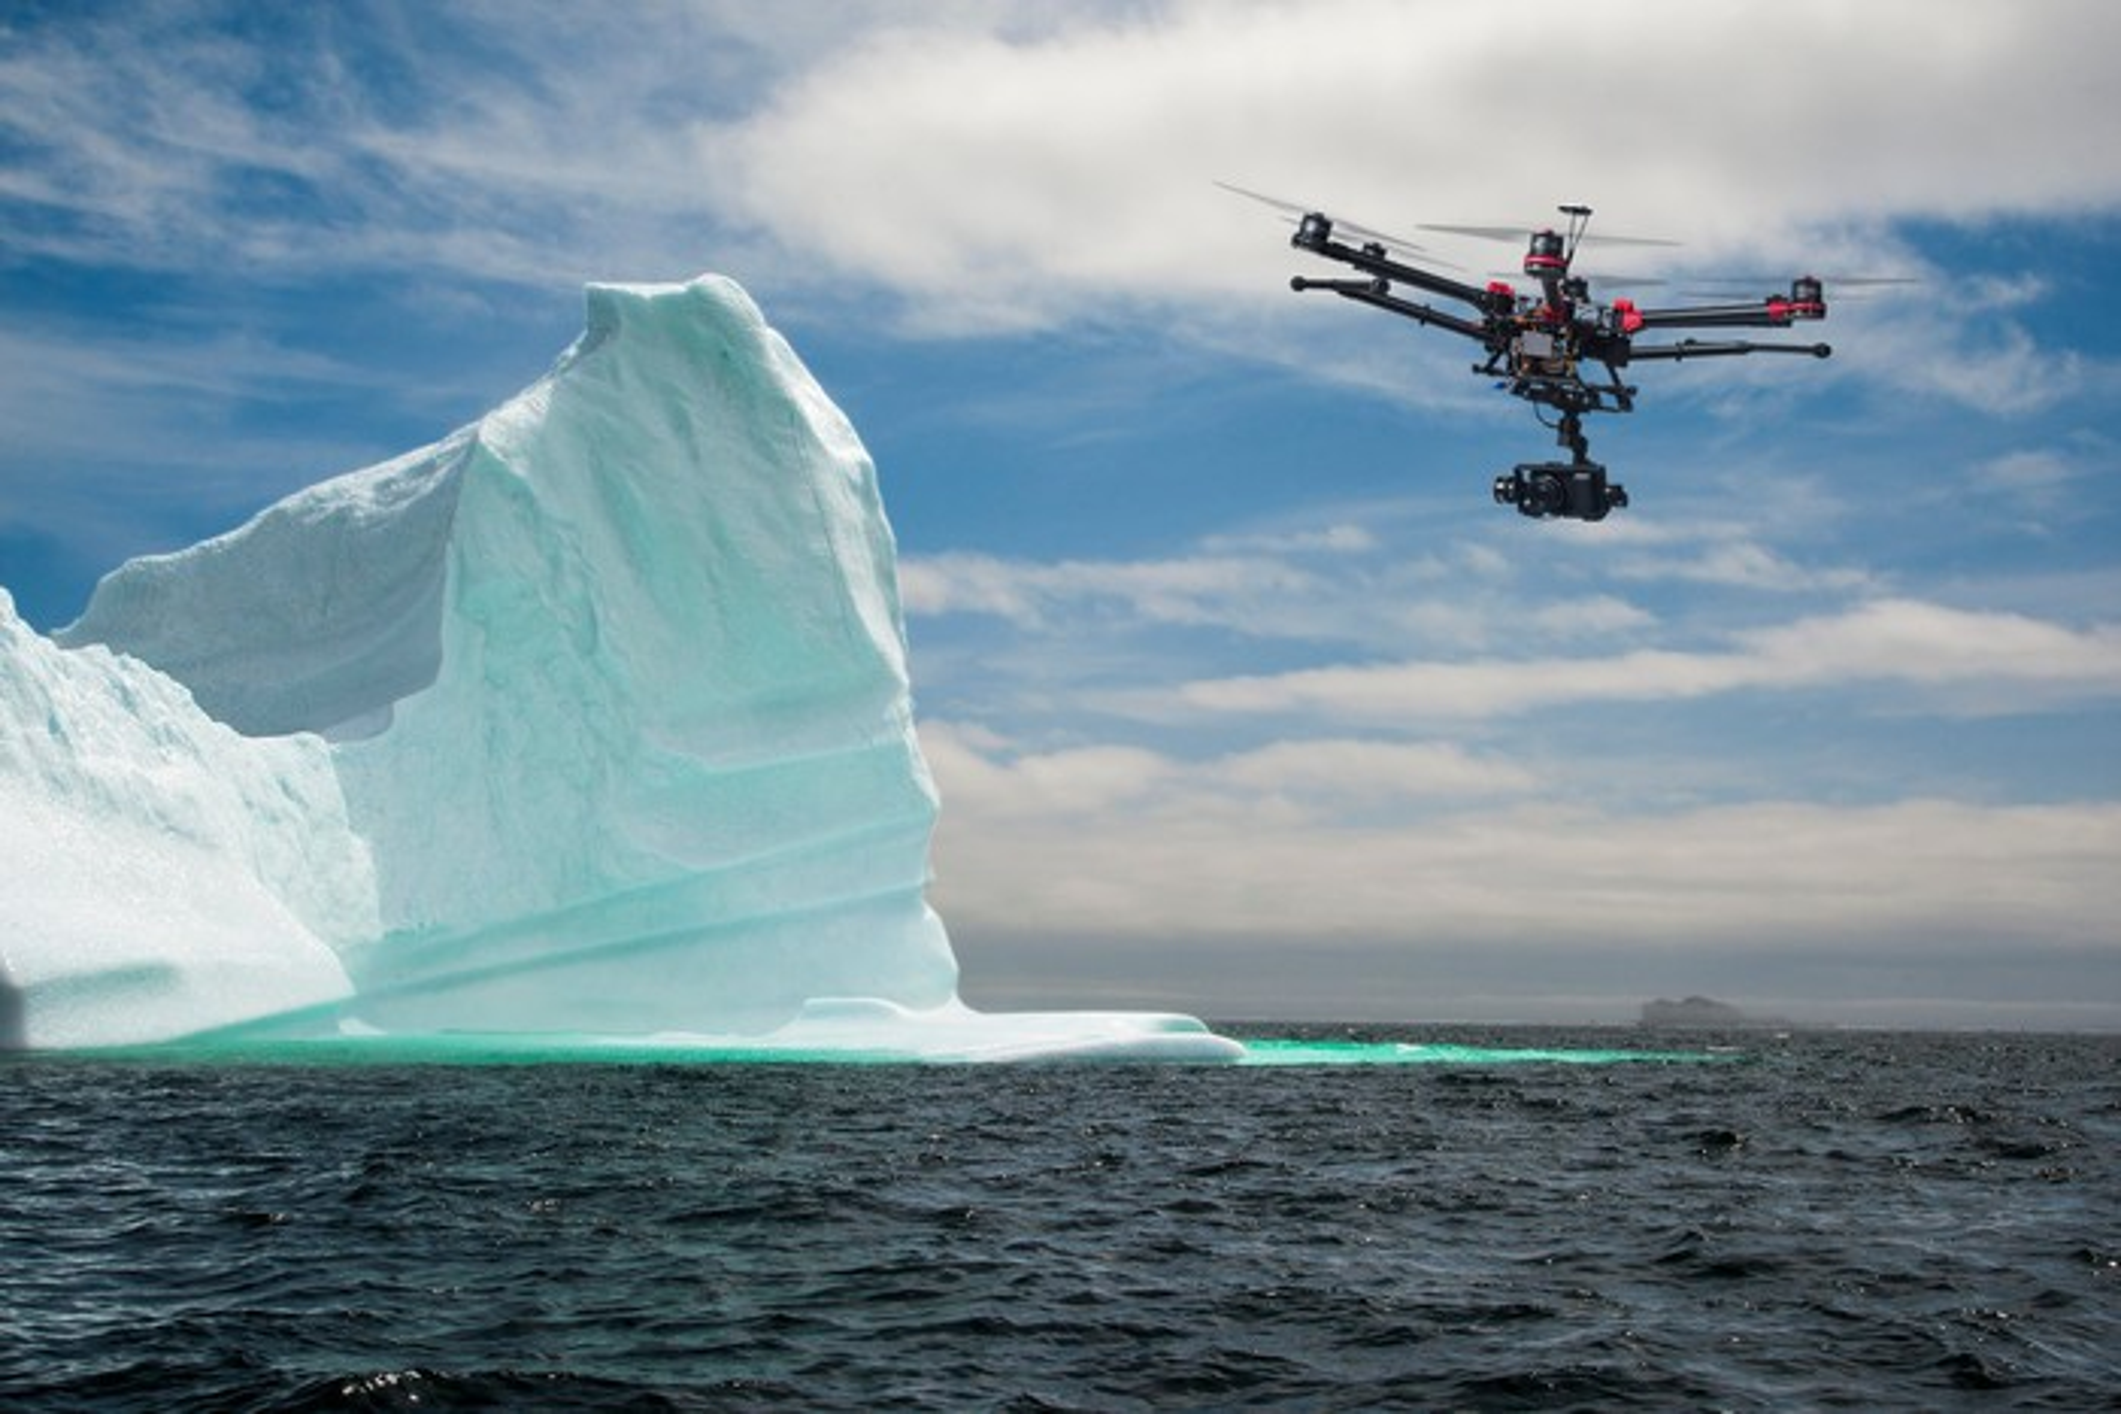 Drone flying near iceberg